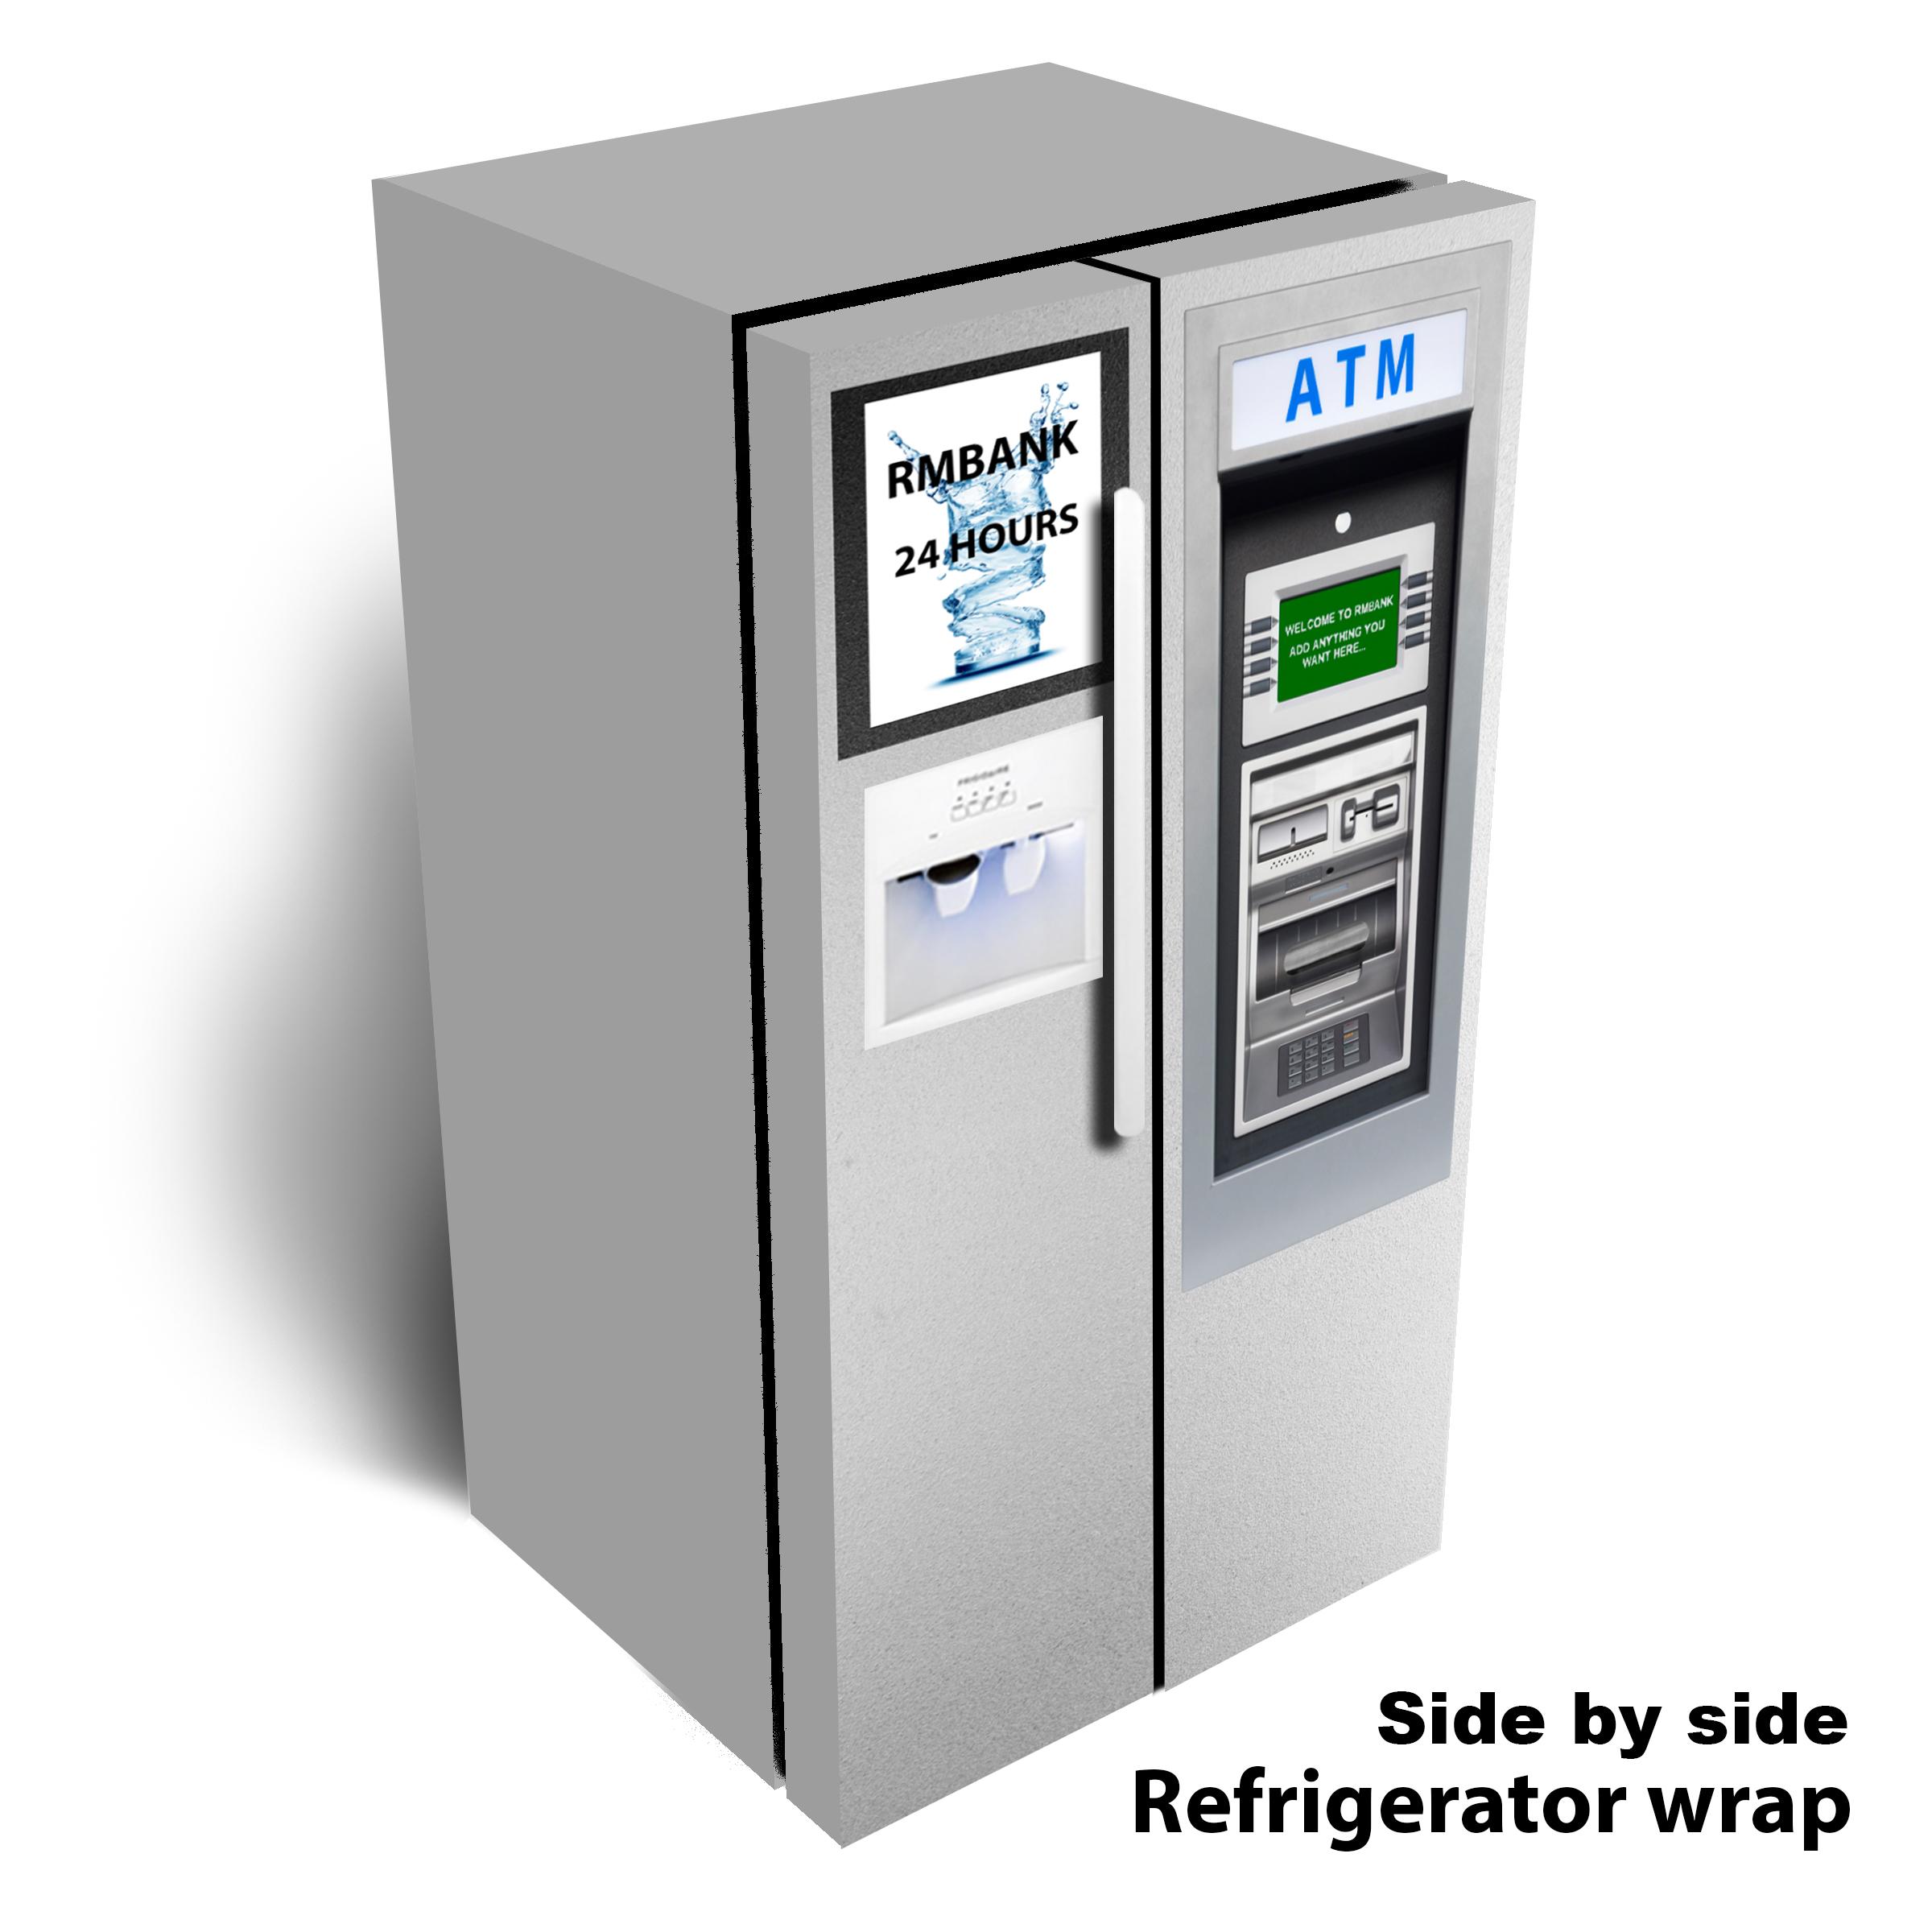 ATM Machine Side by Side Refrigerator Wrap